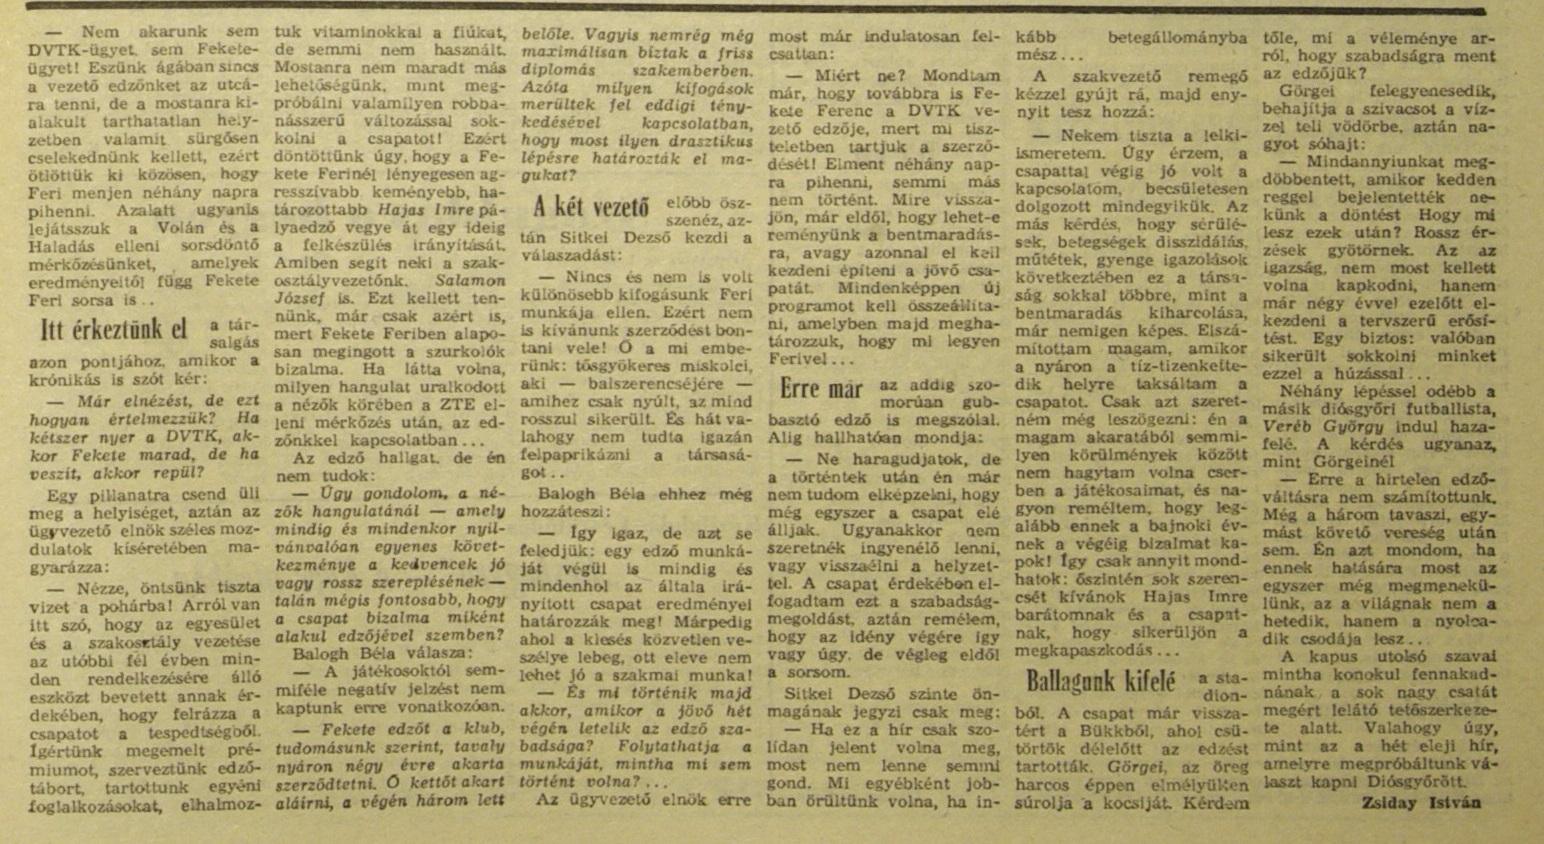 Idokapszula_nb1_1983-84_19_fordulo_DVTK_ugy2.jpg